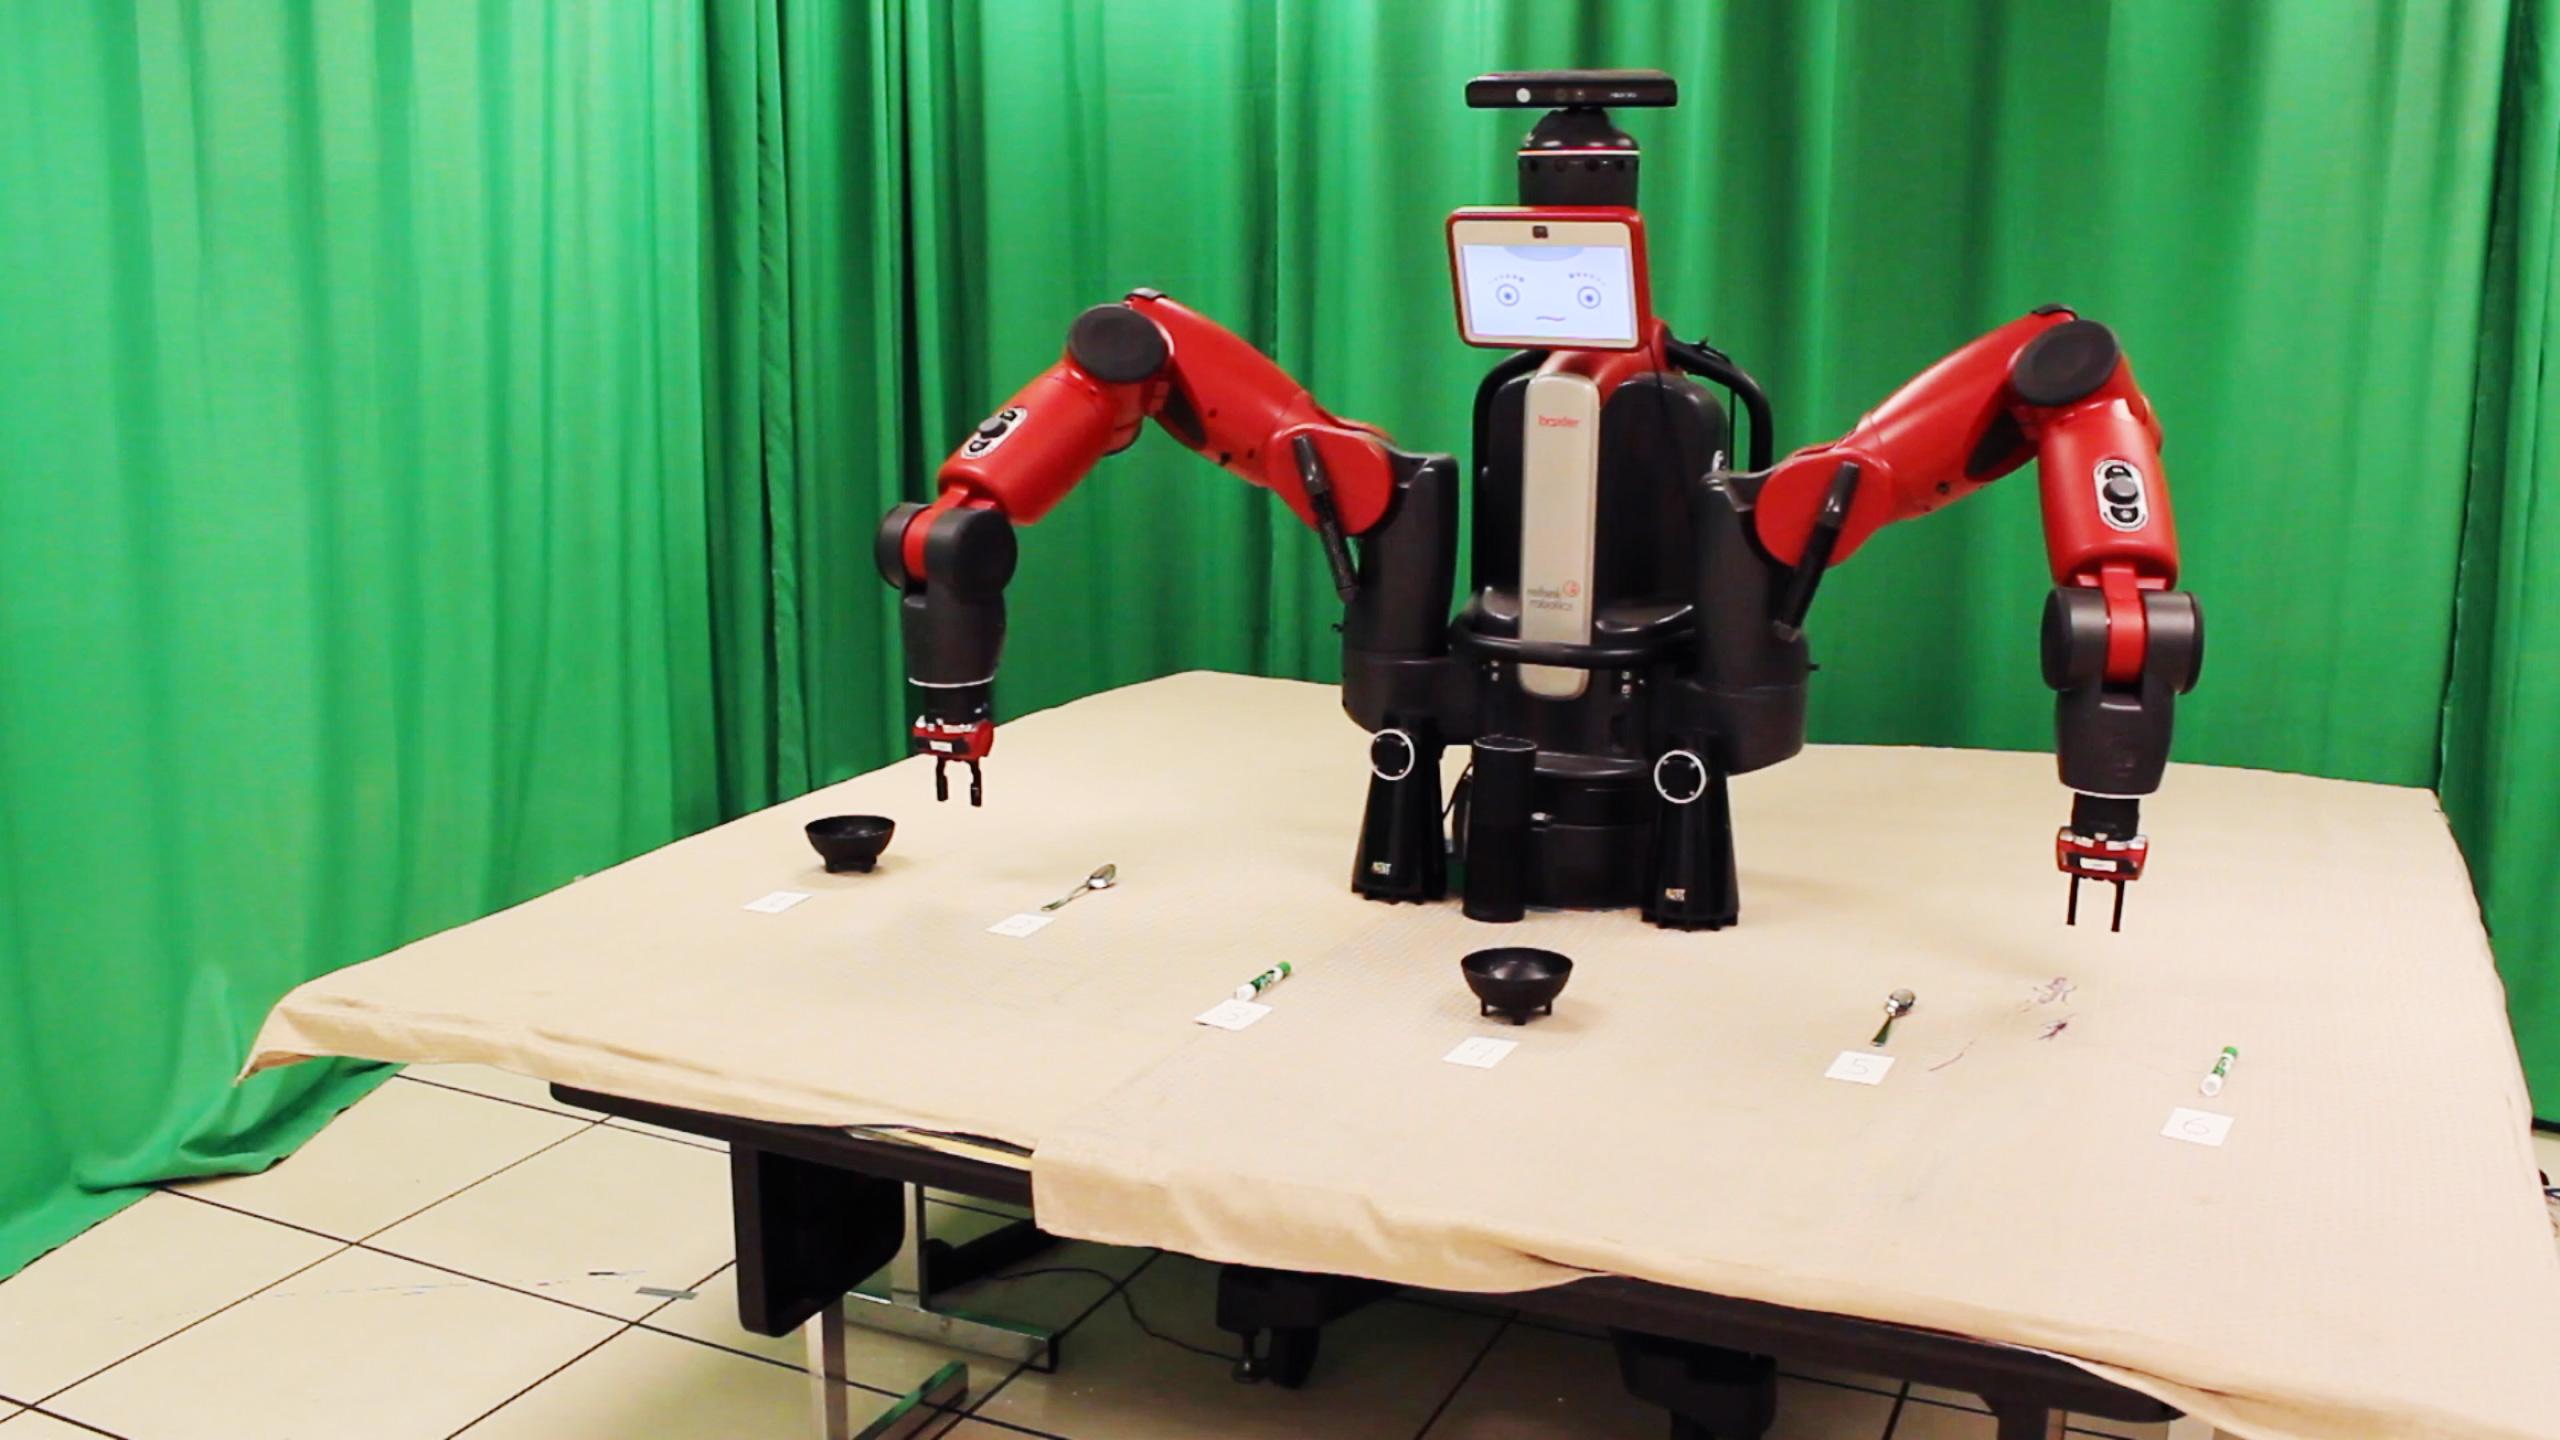 Iorek A Robot That Incorporates Algorithms And Artificial